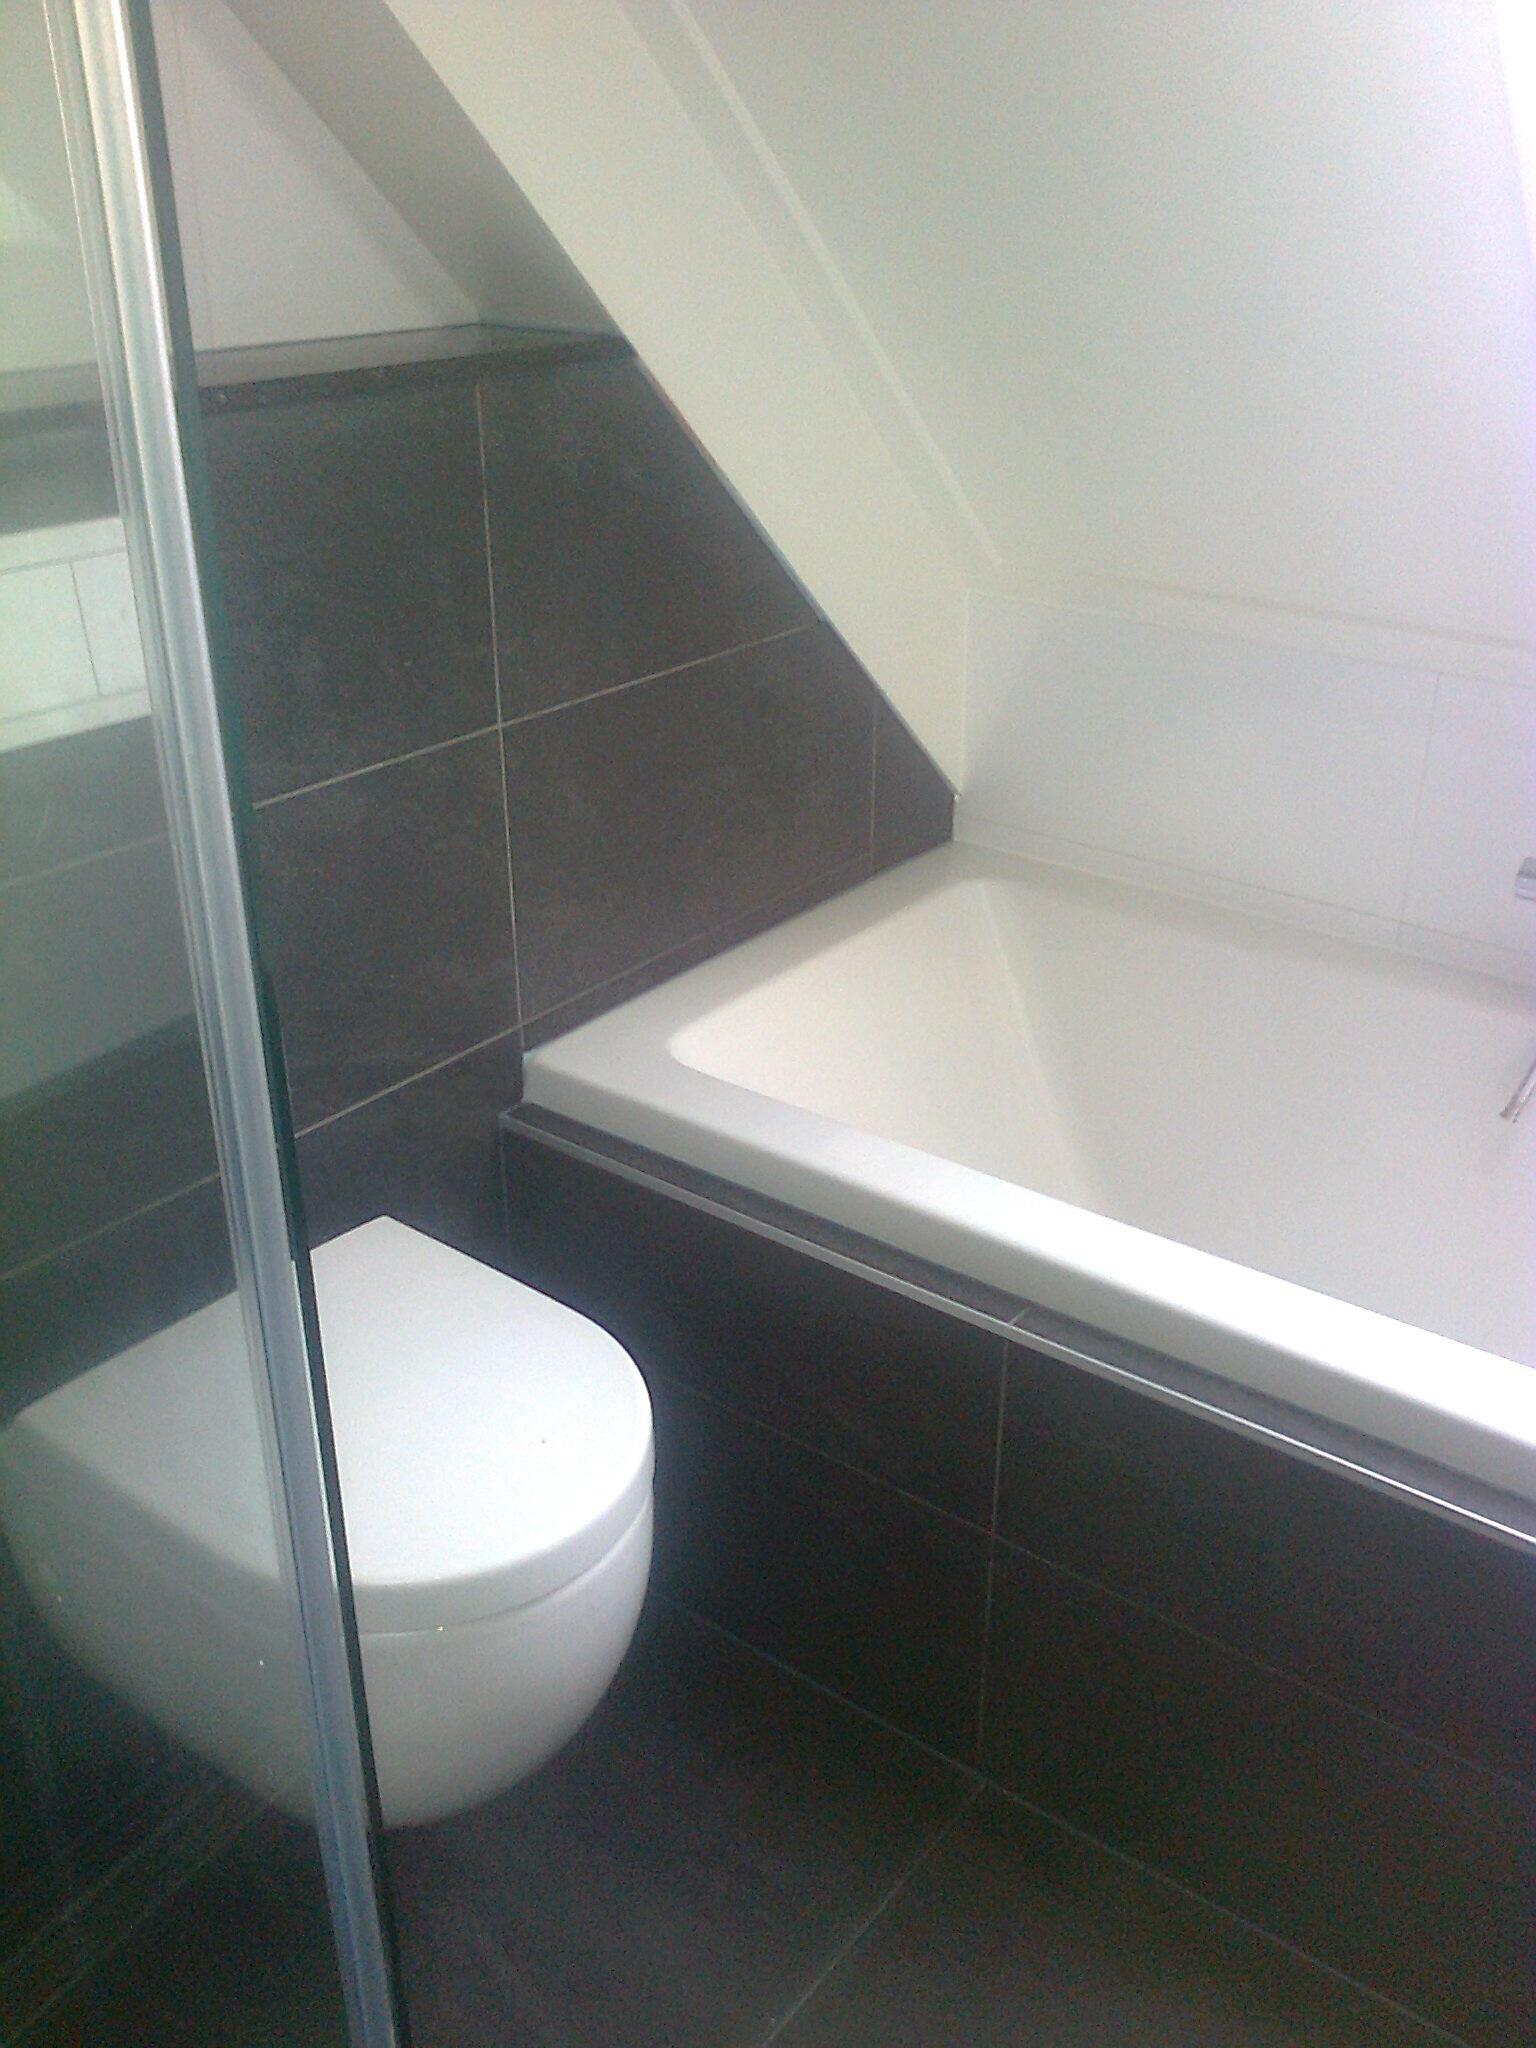 Badkamer met ligbad en toilet - Timmer- en Klussenbedrijf H. Driesen